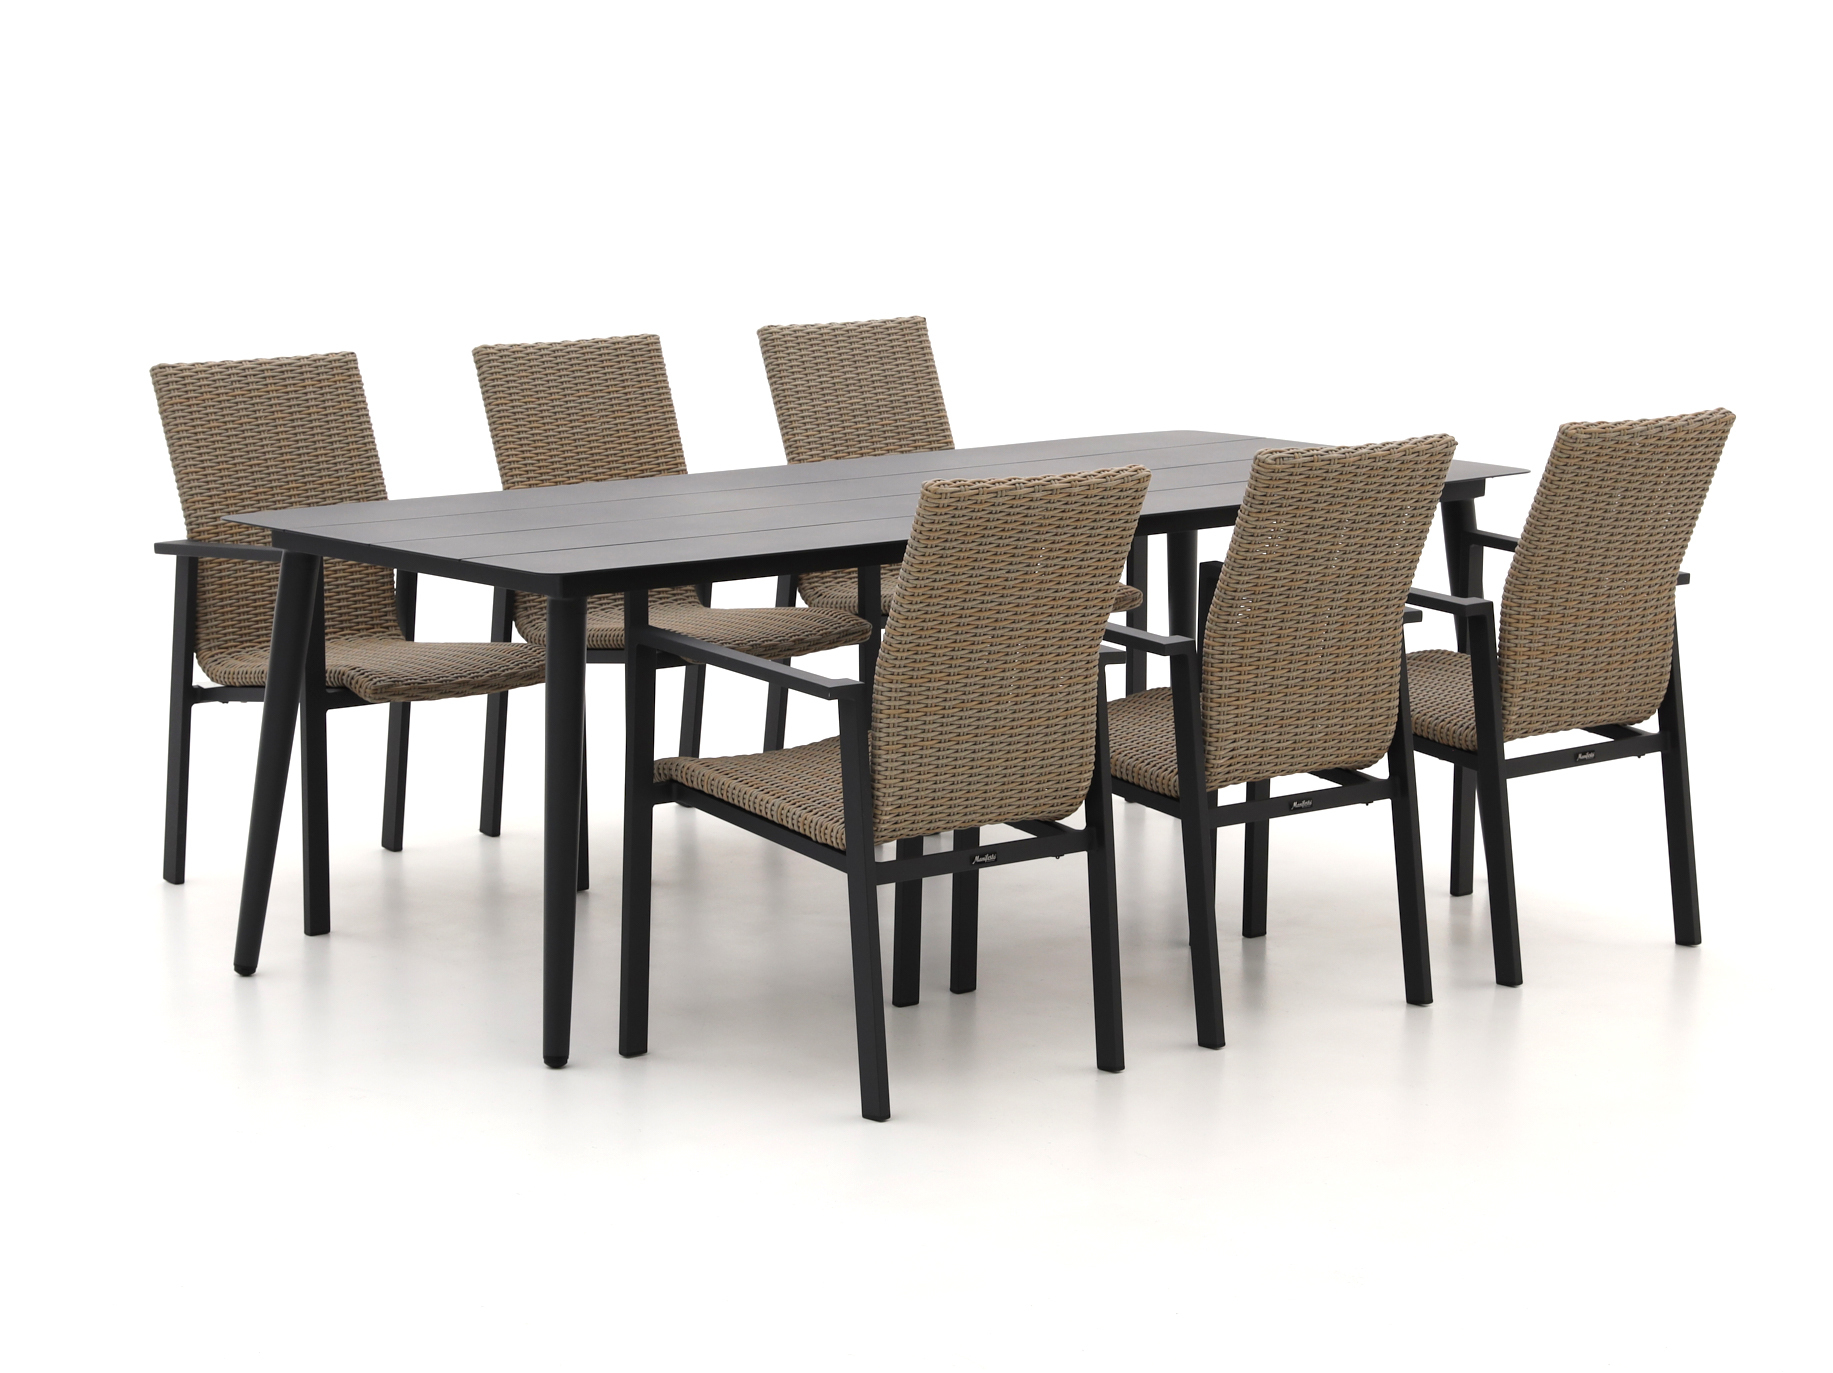 Manifesto Villongo/Sora 220cm dining tuinset 7-delig stapelbaar - Laagste prijsgarantie!